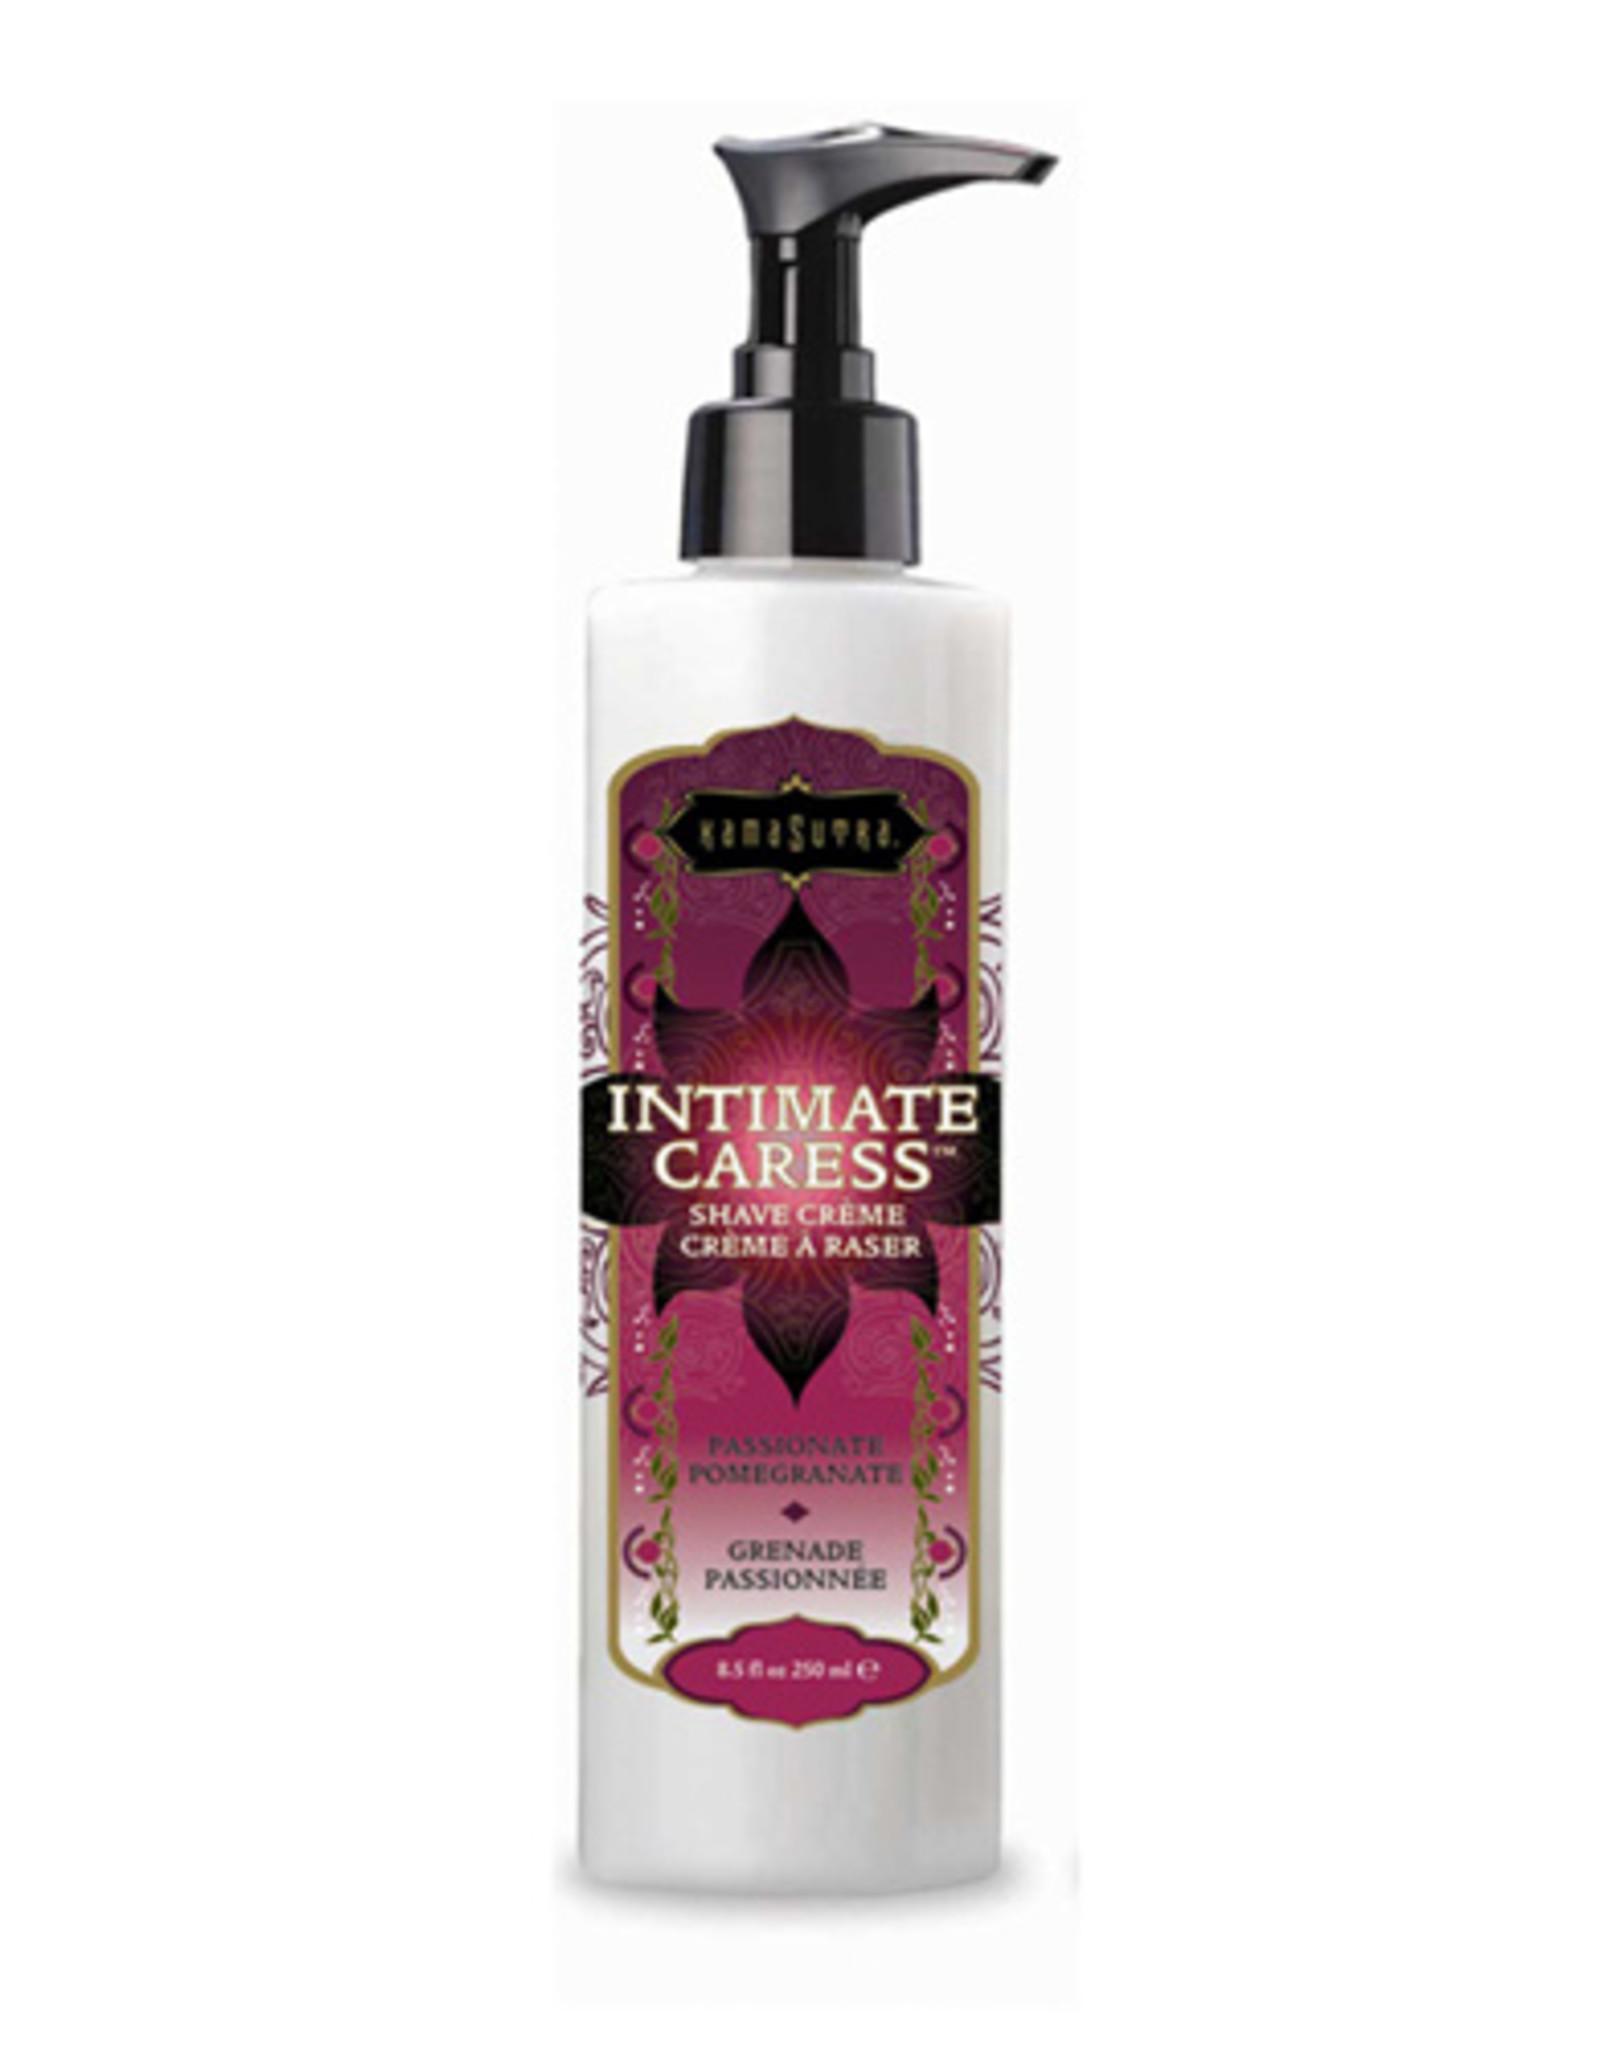 KamaSutra Kamasutra Intimate Caress Pomegranate Scheercrème